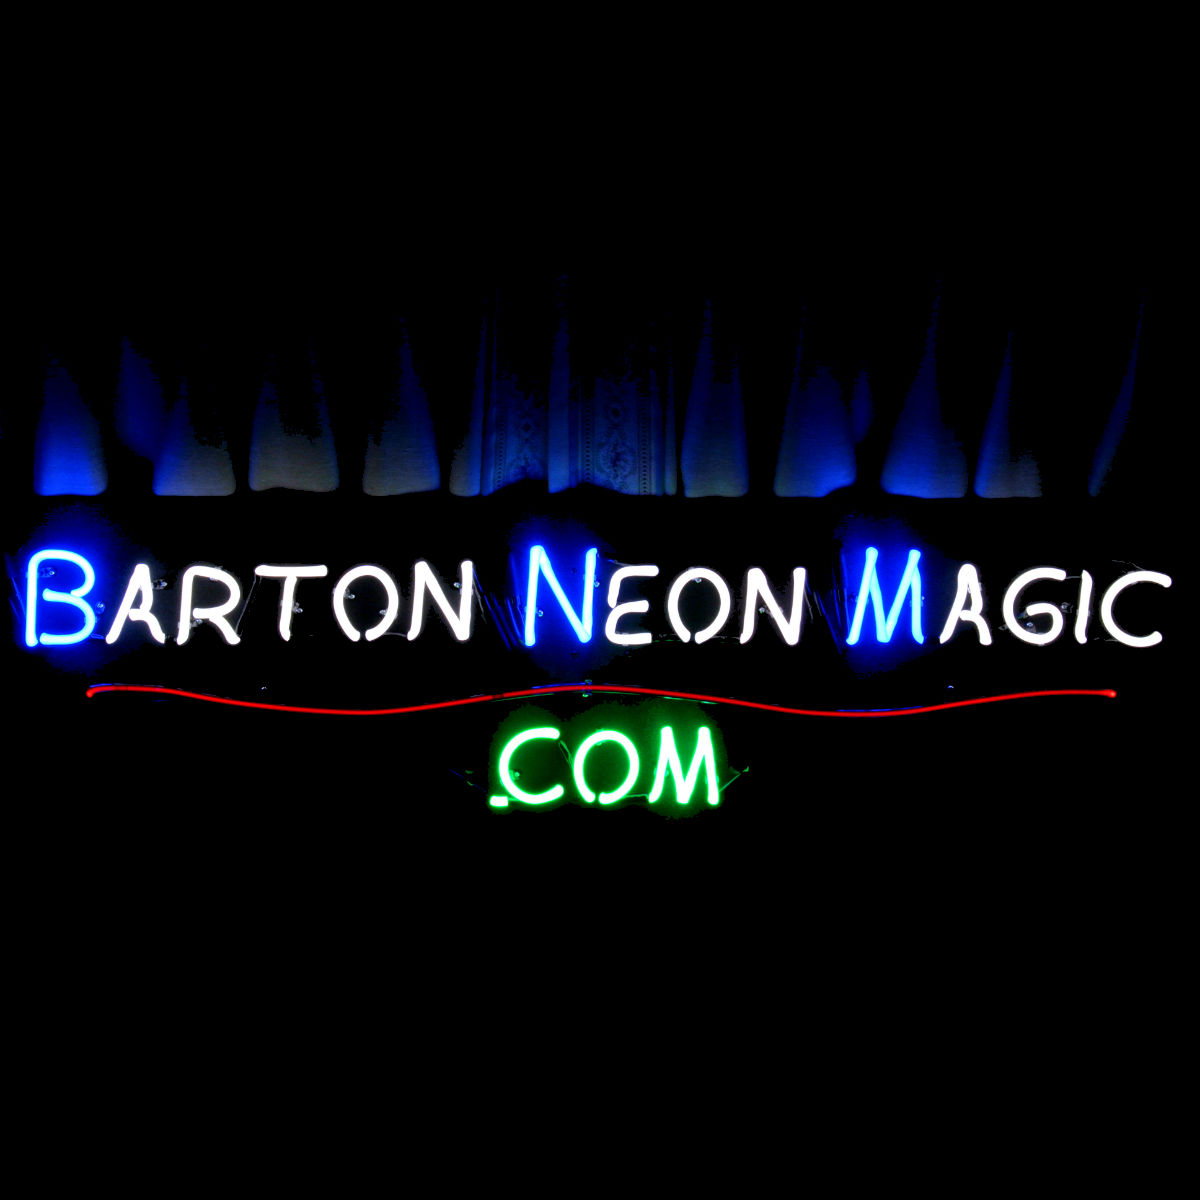 The Finest in Custom Neon Lighting by BartonNeonMagic.com - John Barton - Famous USA Neon Light Sculptor